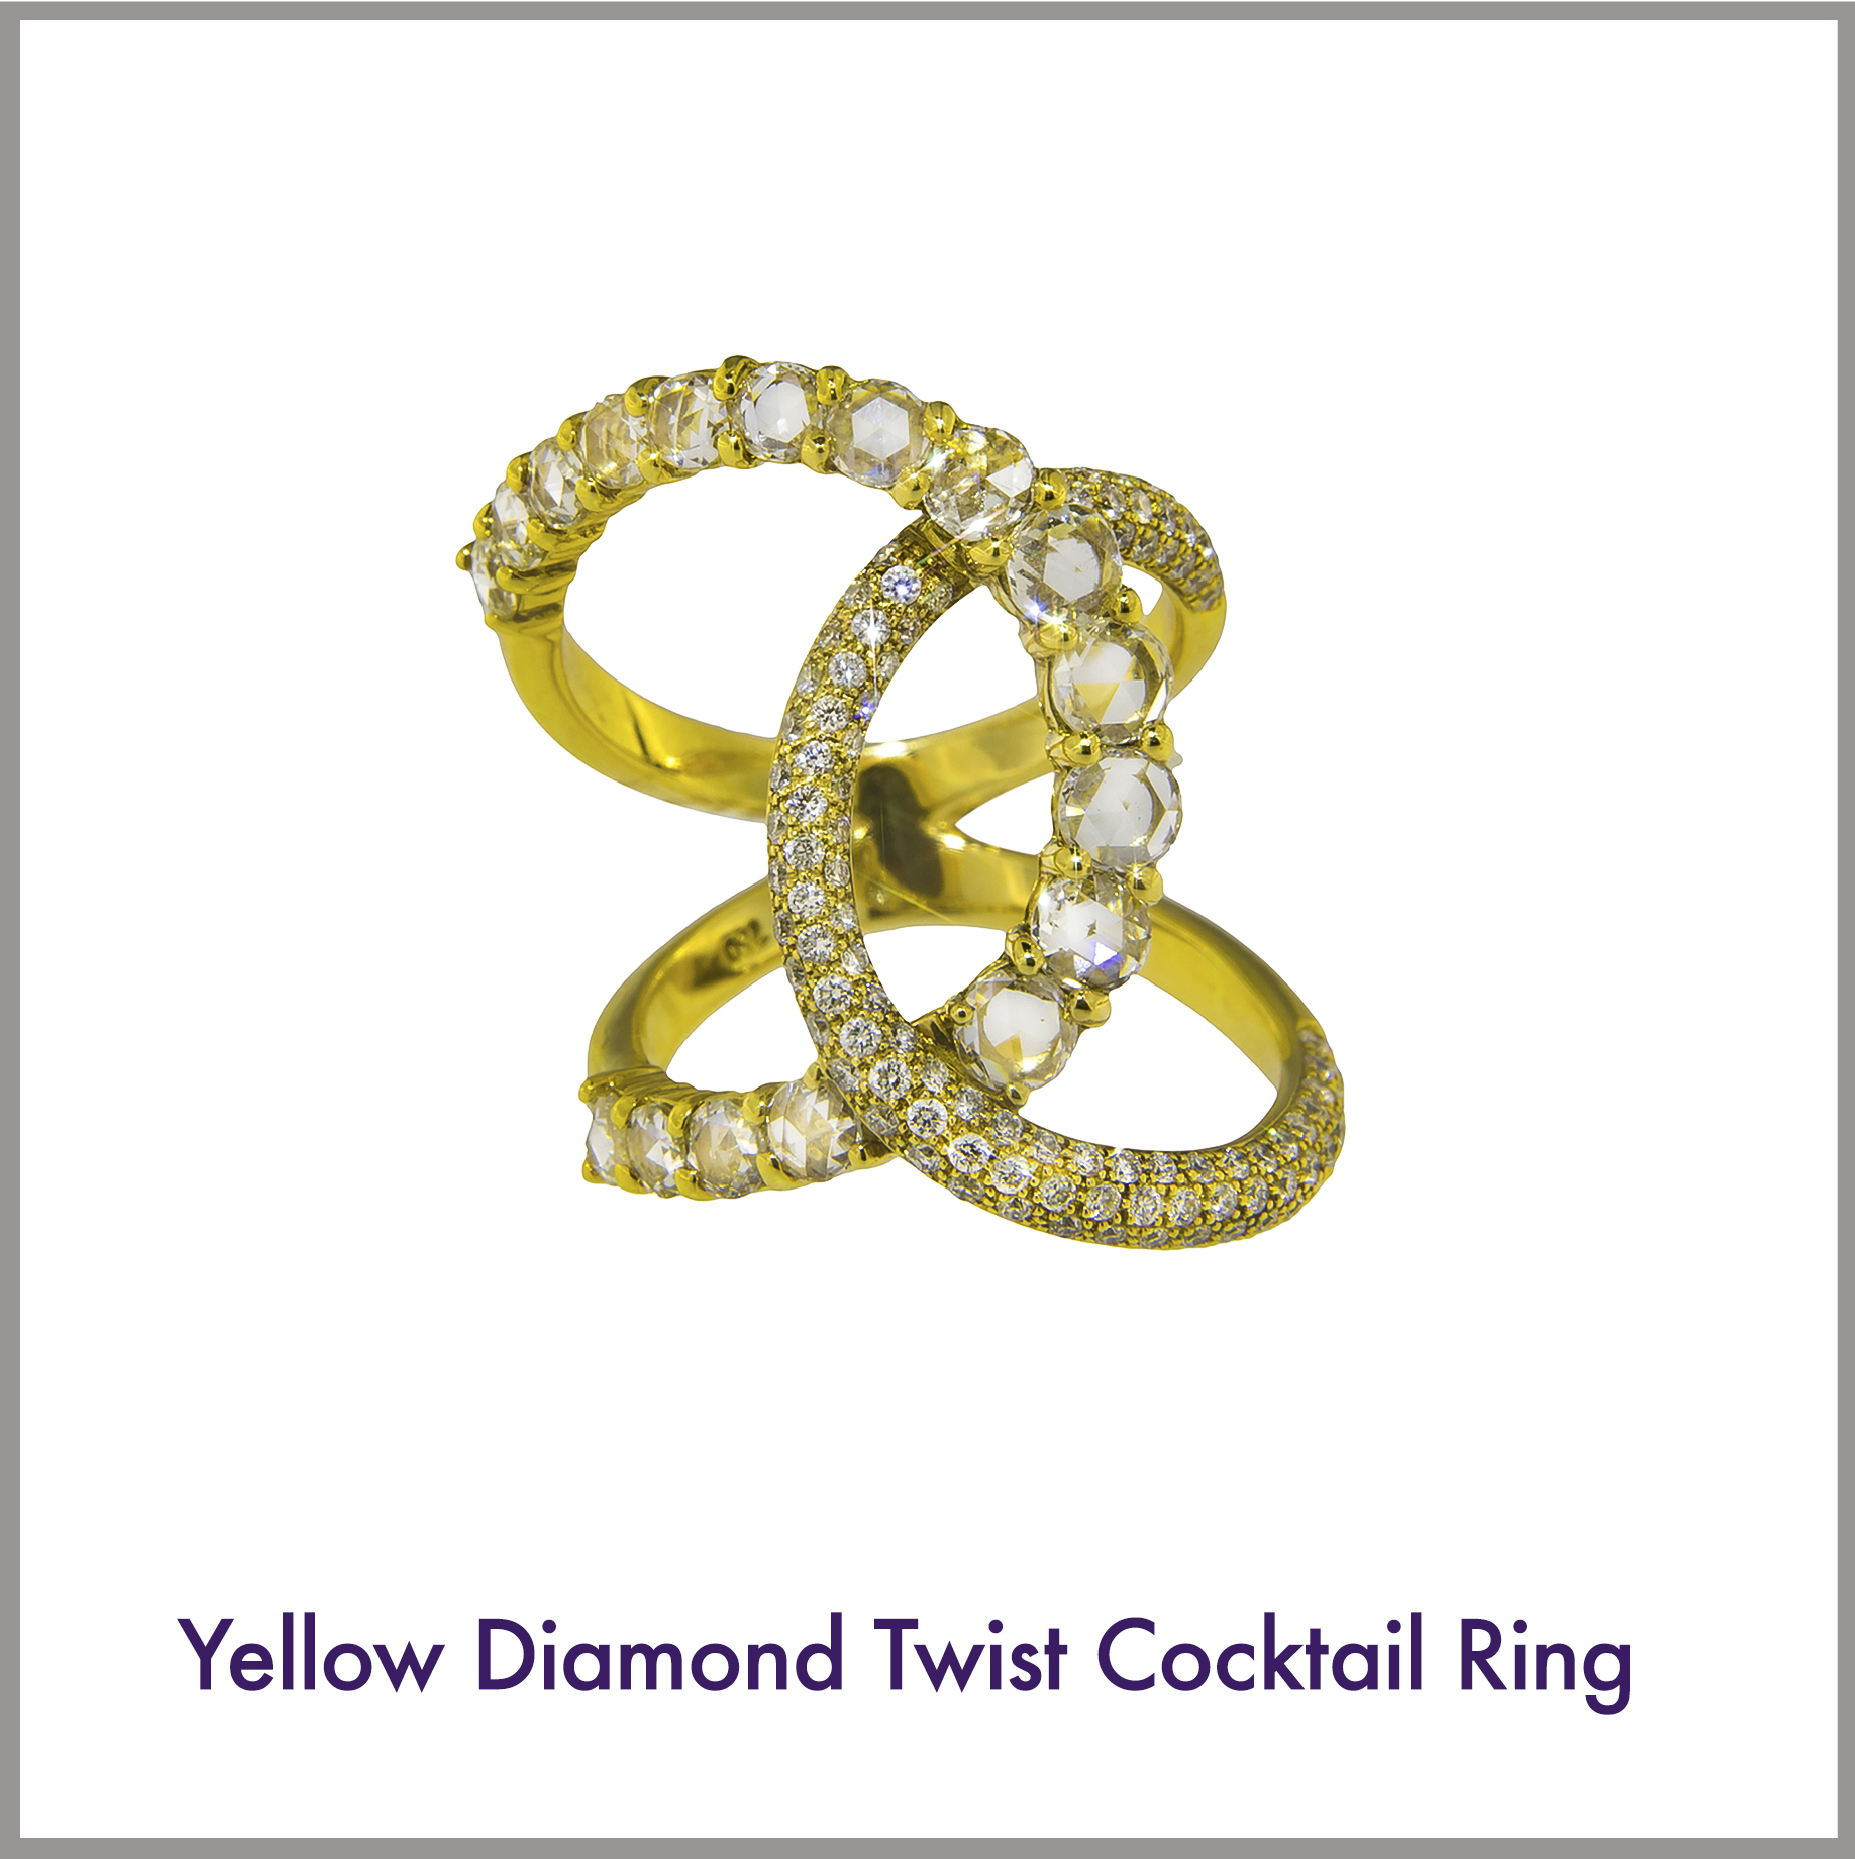 Yellow Diamond Twist Cocktail Ring